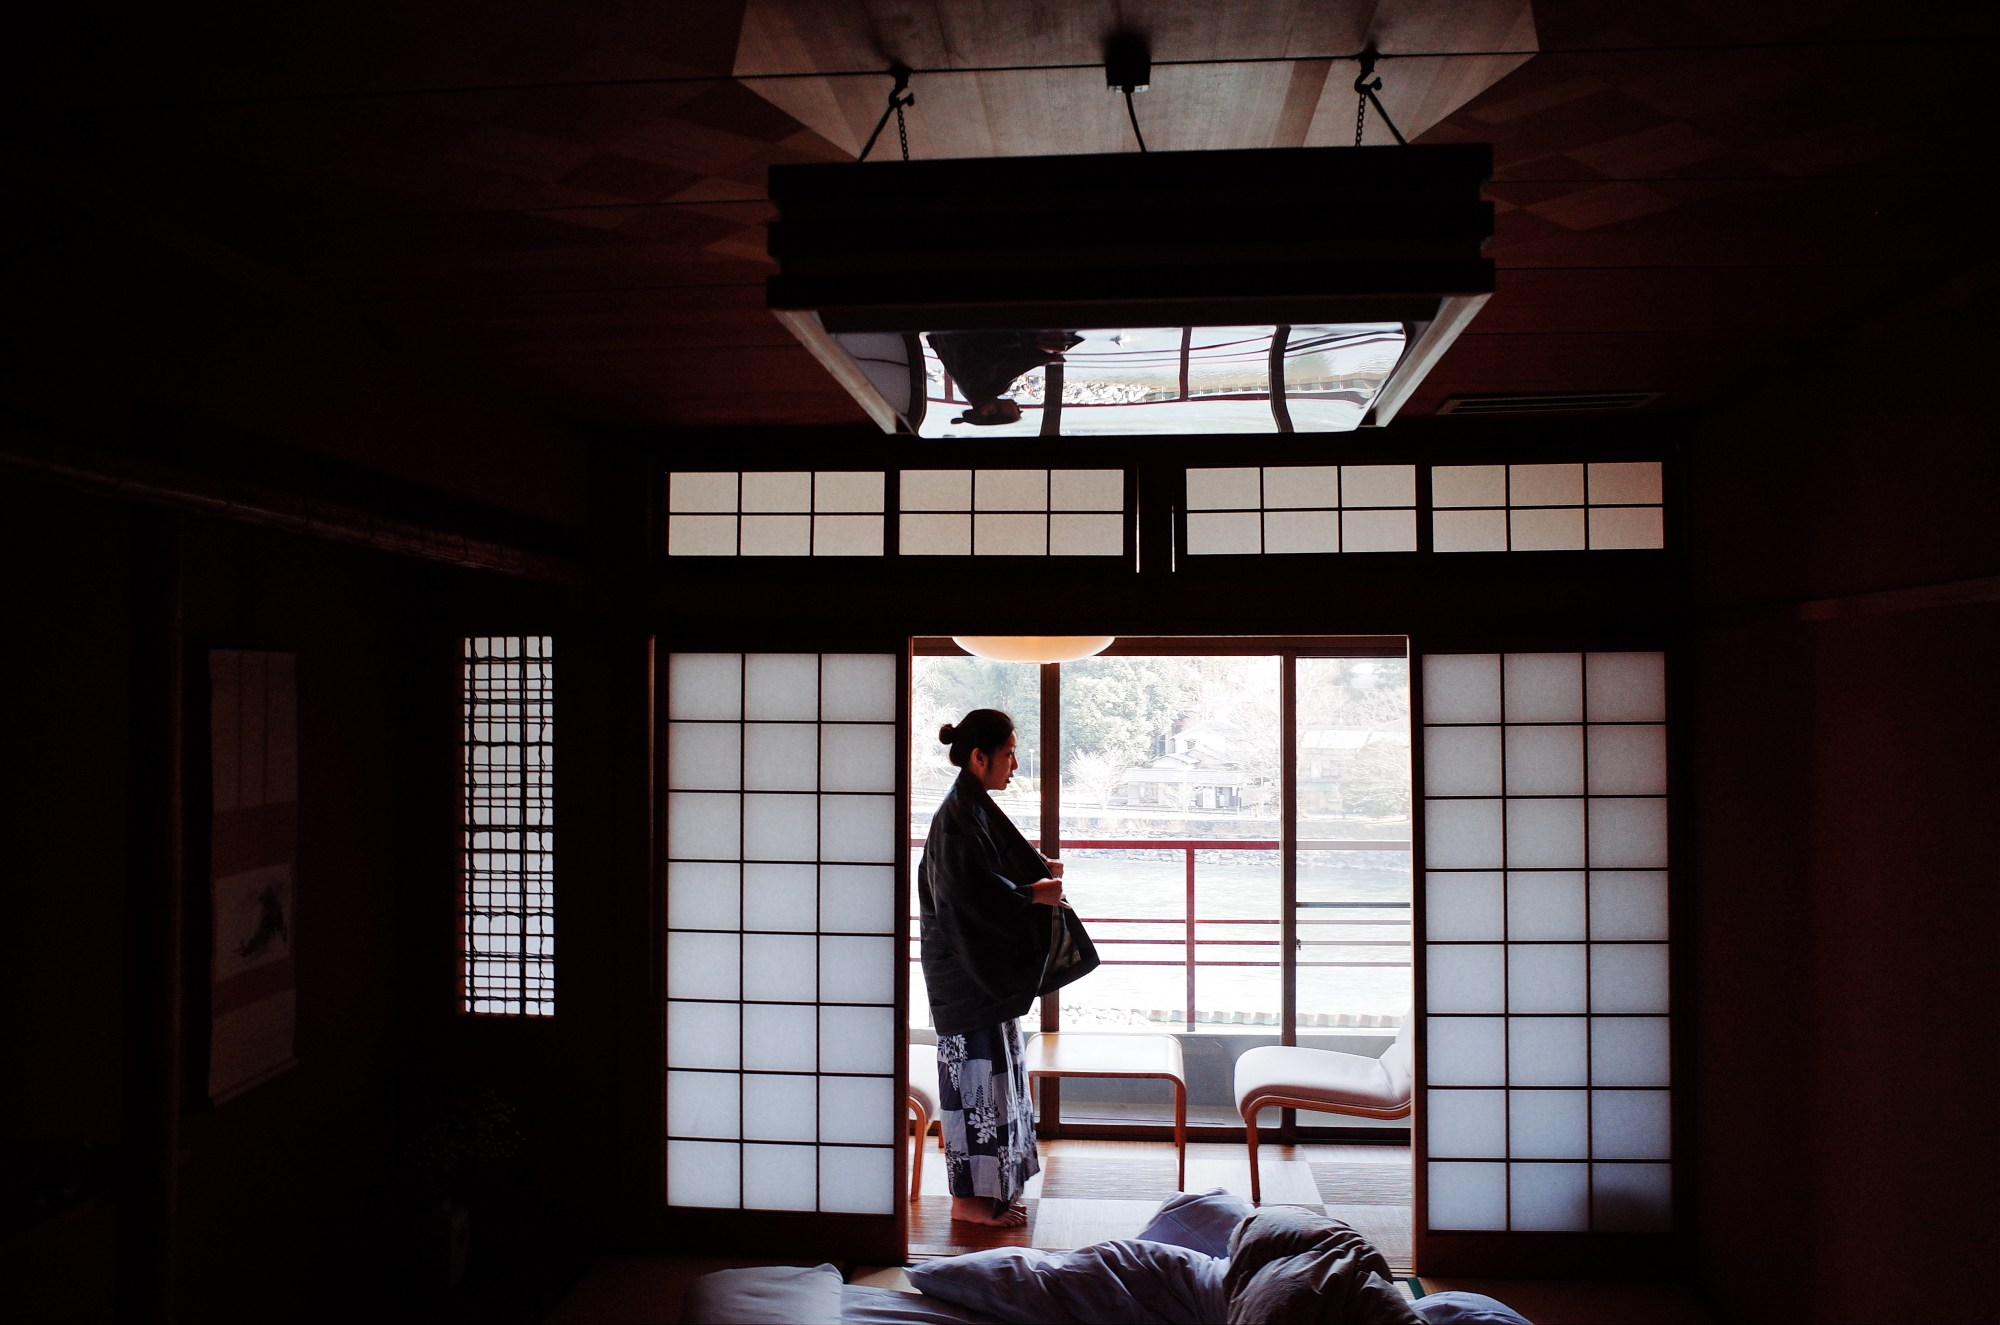 Ryokan. Uji / Kyoto, 2018 #cindyproject